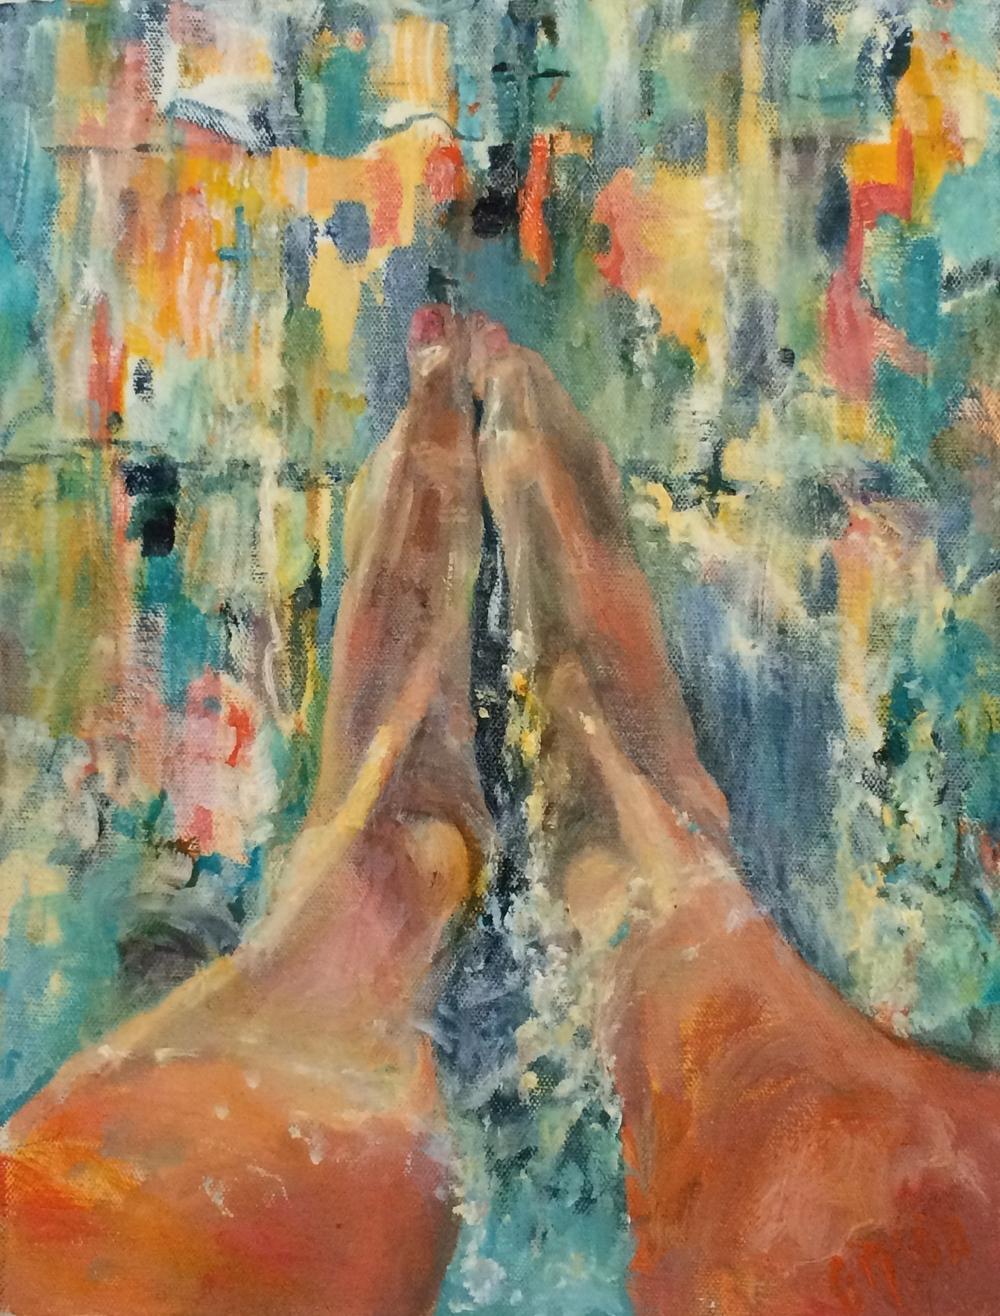 Feet-a-prayin'